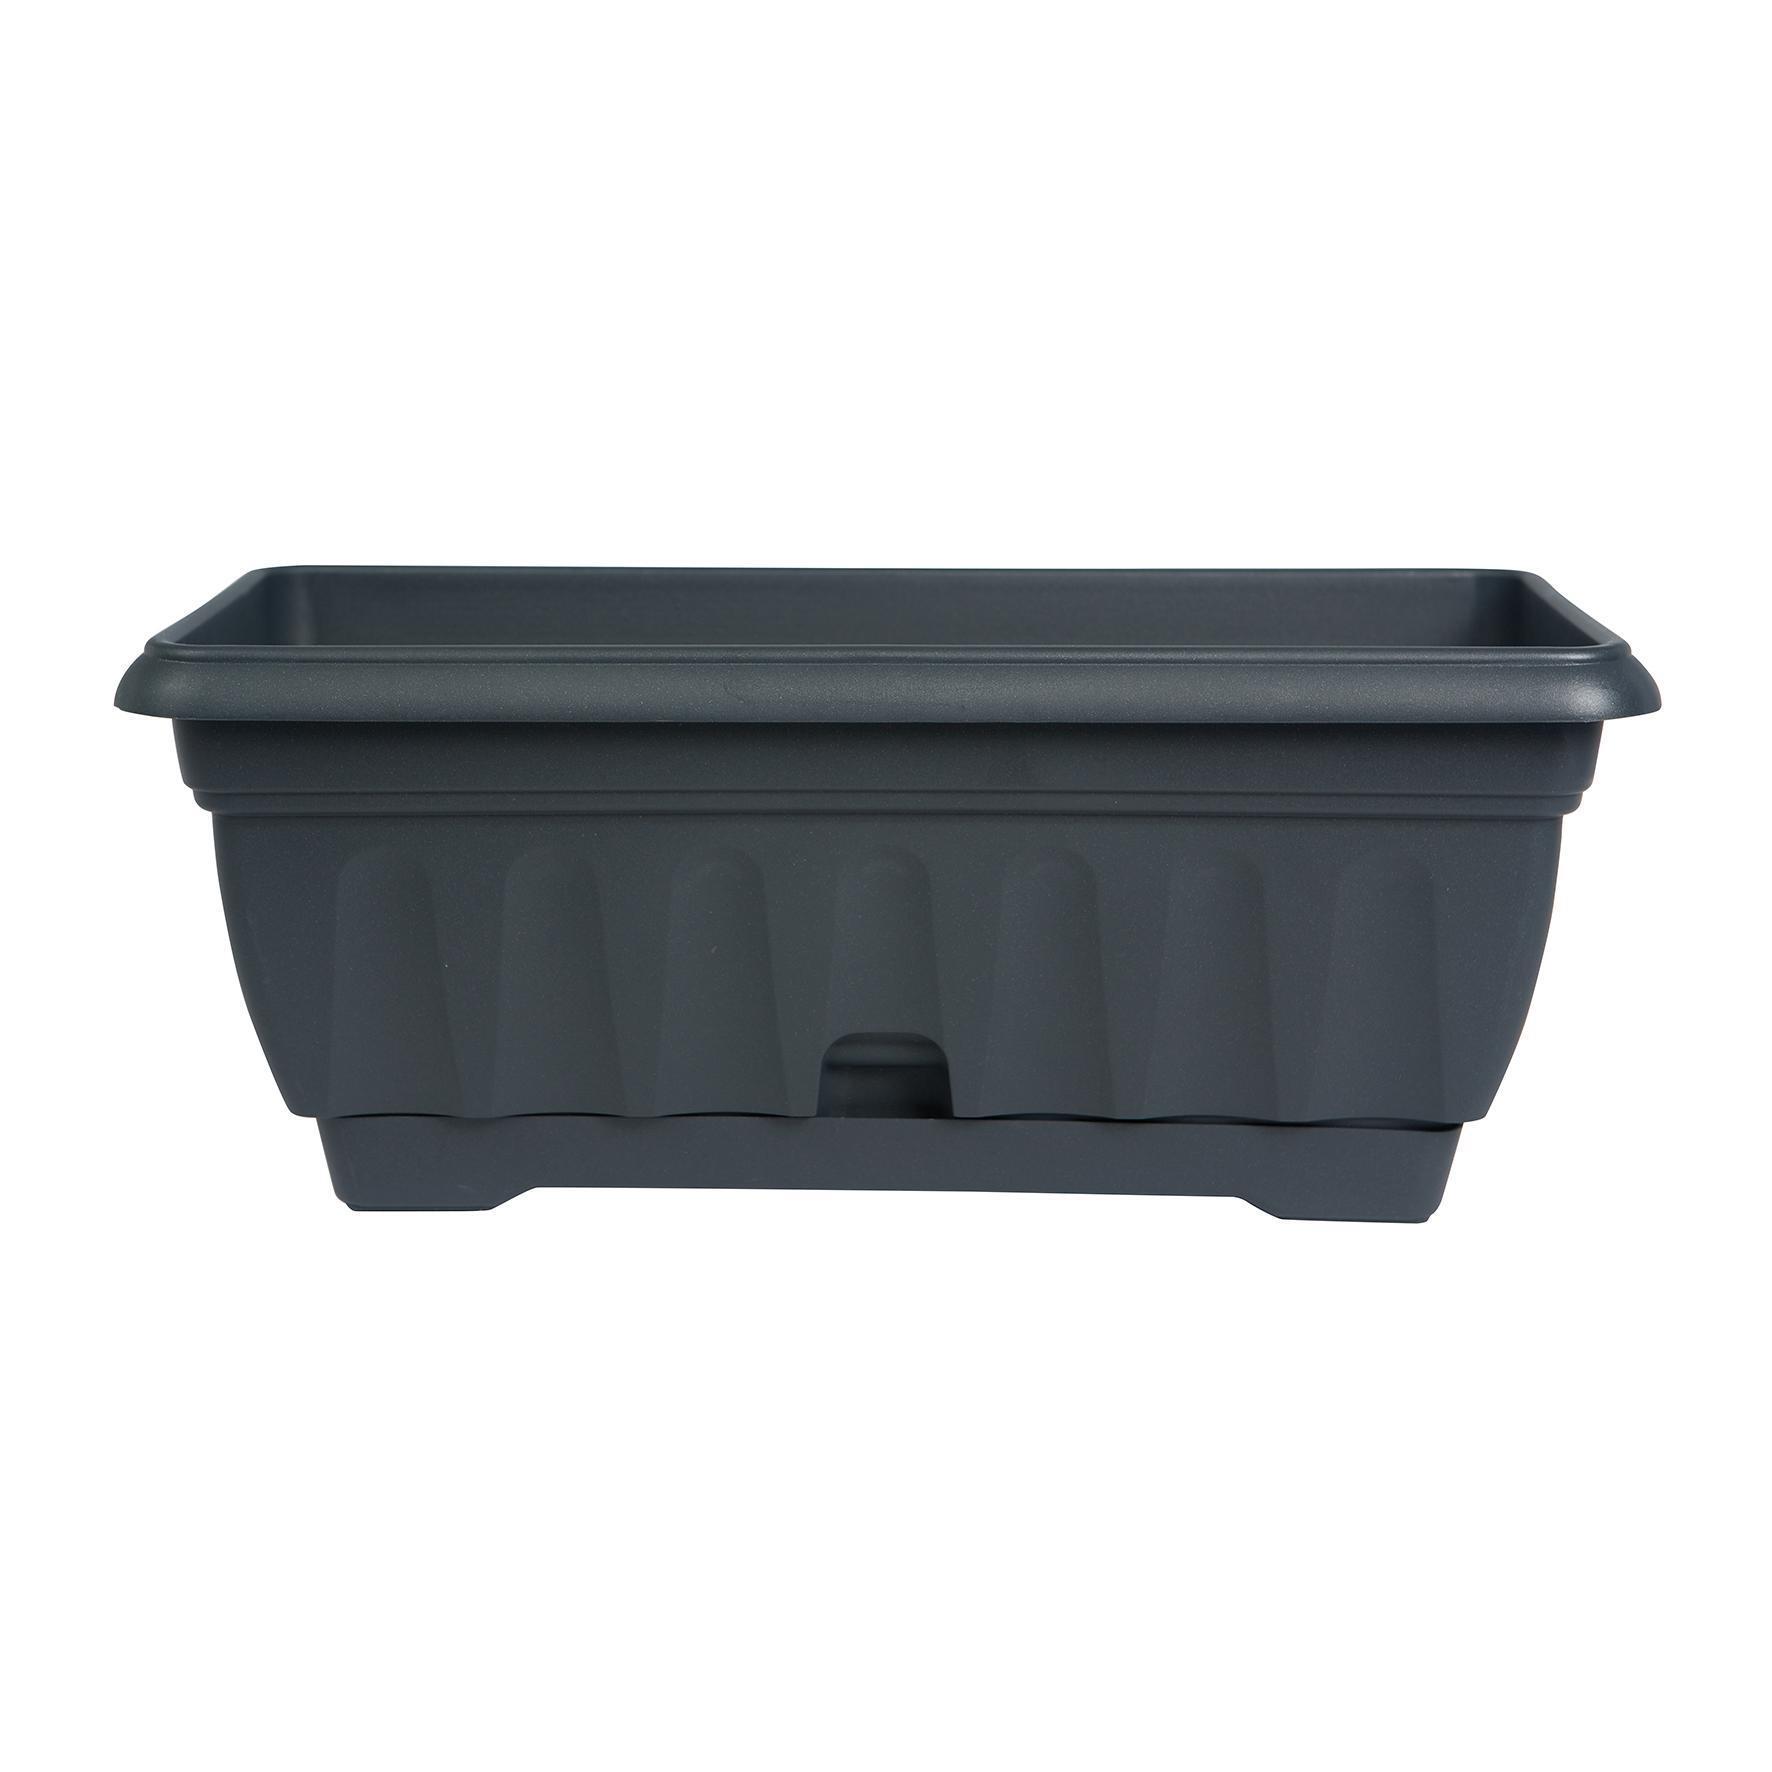 Cassetta portafiori Imagna in plastica grigio antracite H 18 , L 42 X P 20 cm